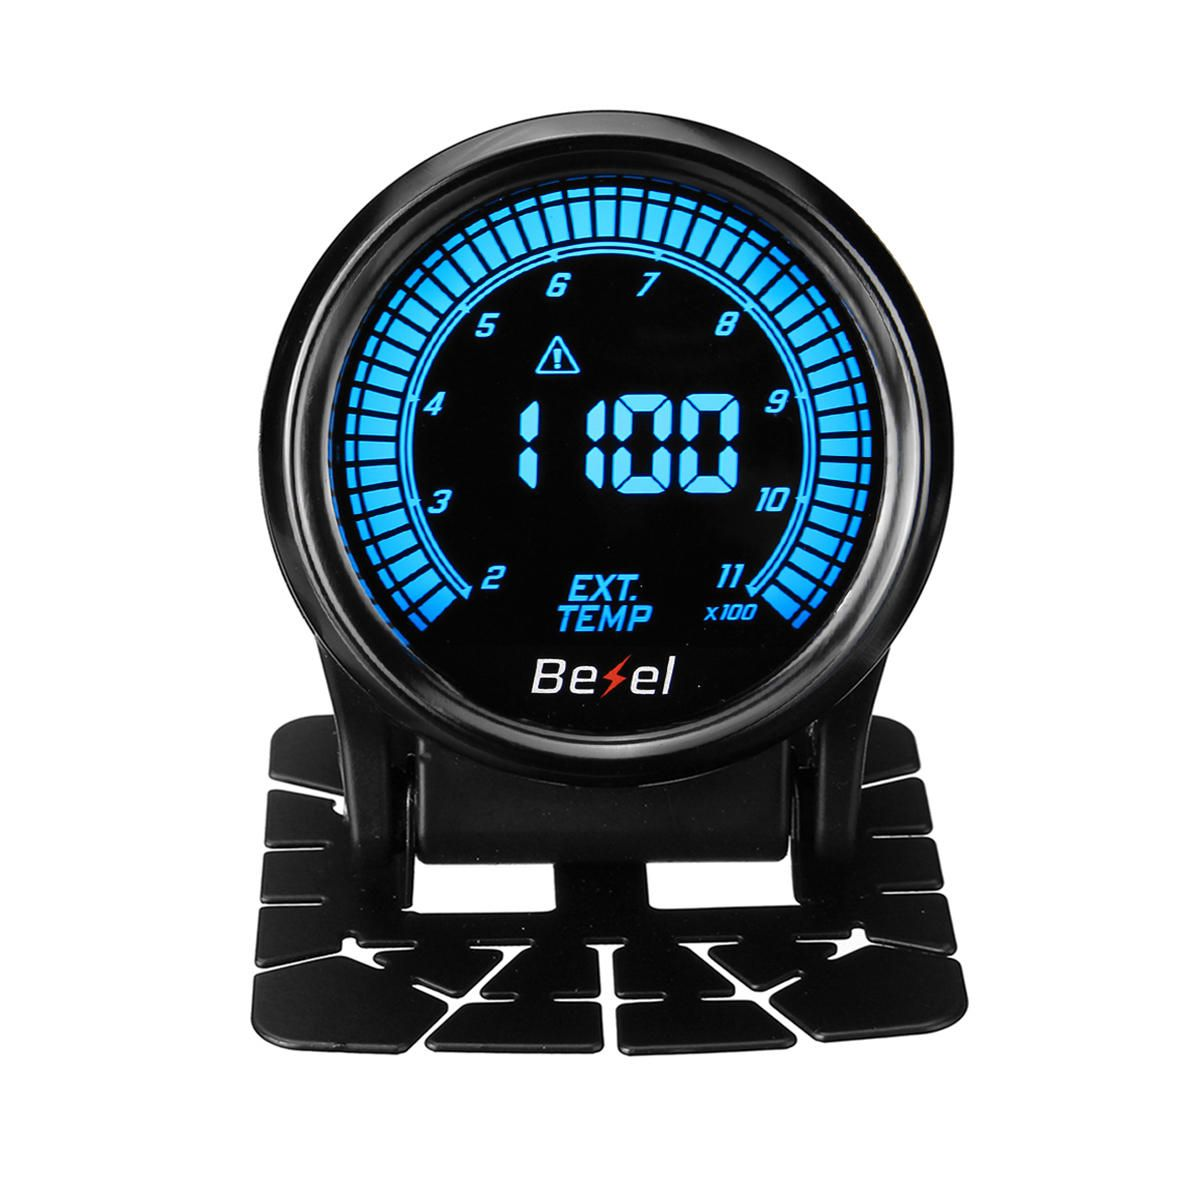 EVO 2 52mm Exhaust Gas Temp Temperature Gauge Meter Digital LED Display w/Sensor